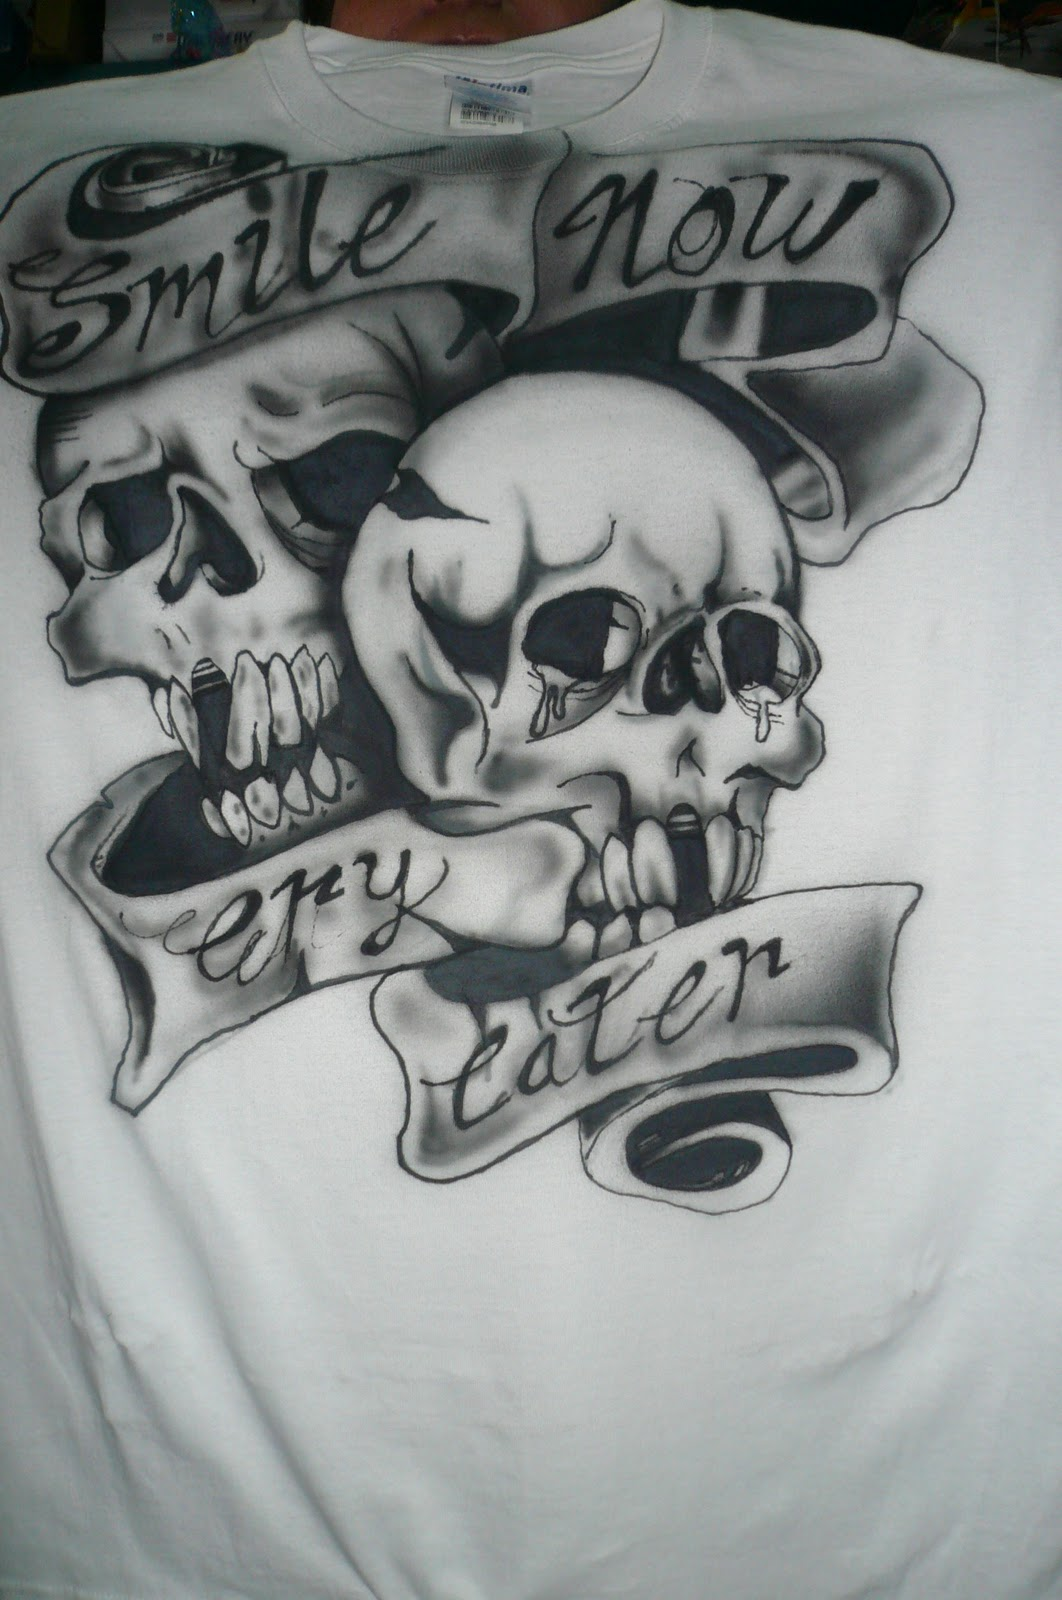 http://4.bp.blogspot.com/_AUKZAGJ_eNU/TS1C9CW4ObI/AAAAAAAAACM/UlBSFAzQOy8/s1600/P1070616.JPG